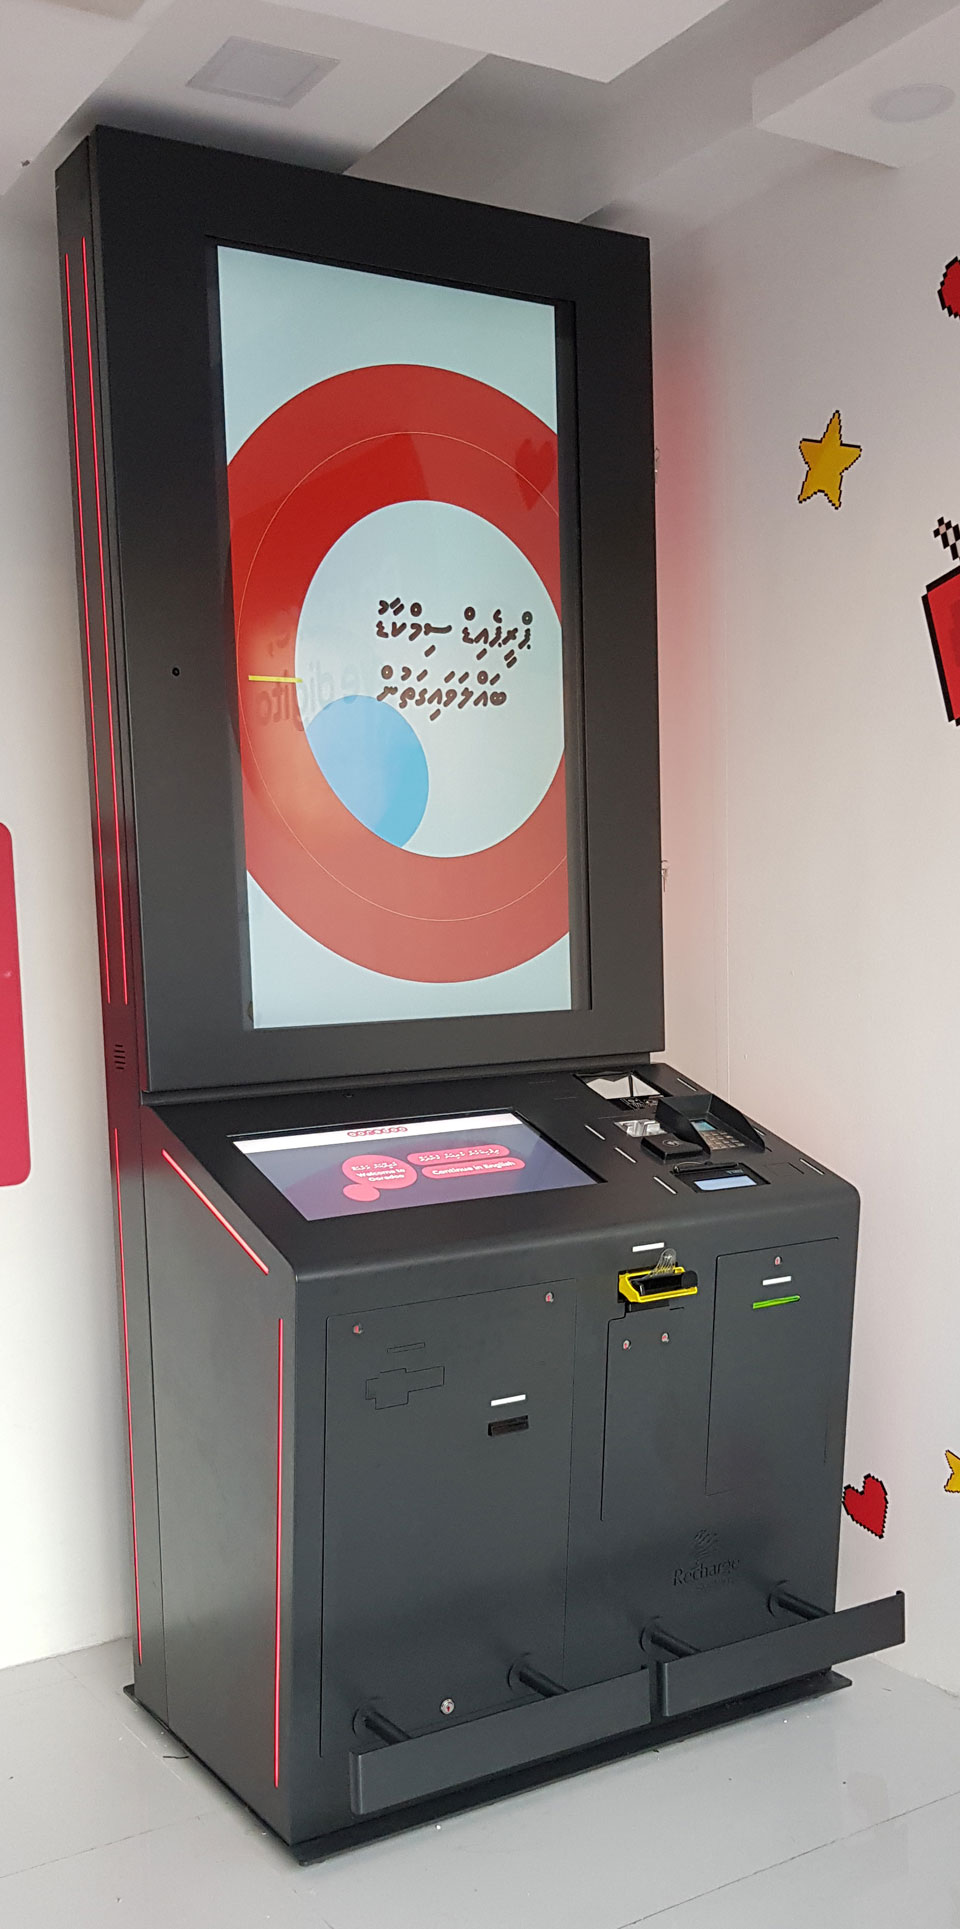 Self-service transactional kiosk for Qatar